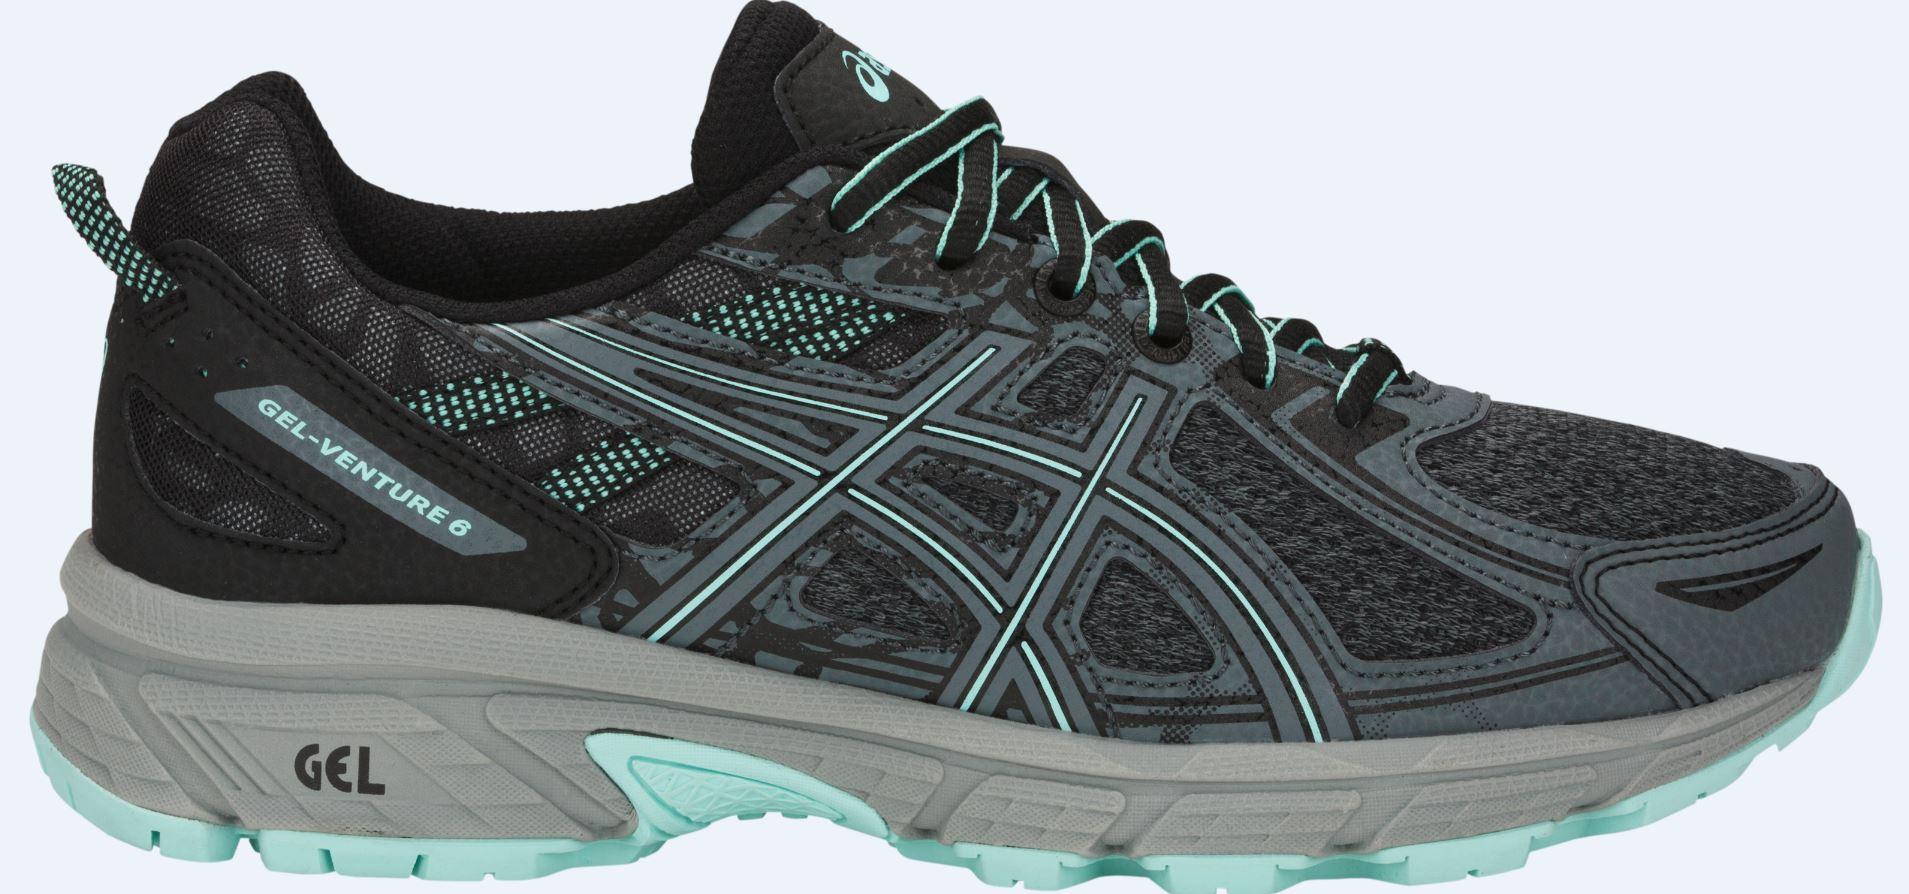 528dce7be2 ASICS: ASICS Women's GEL-Venture 6 MX Running Shoes 1012A504 ...